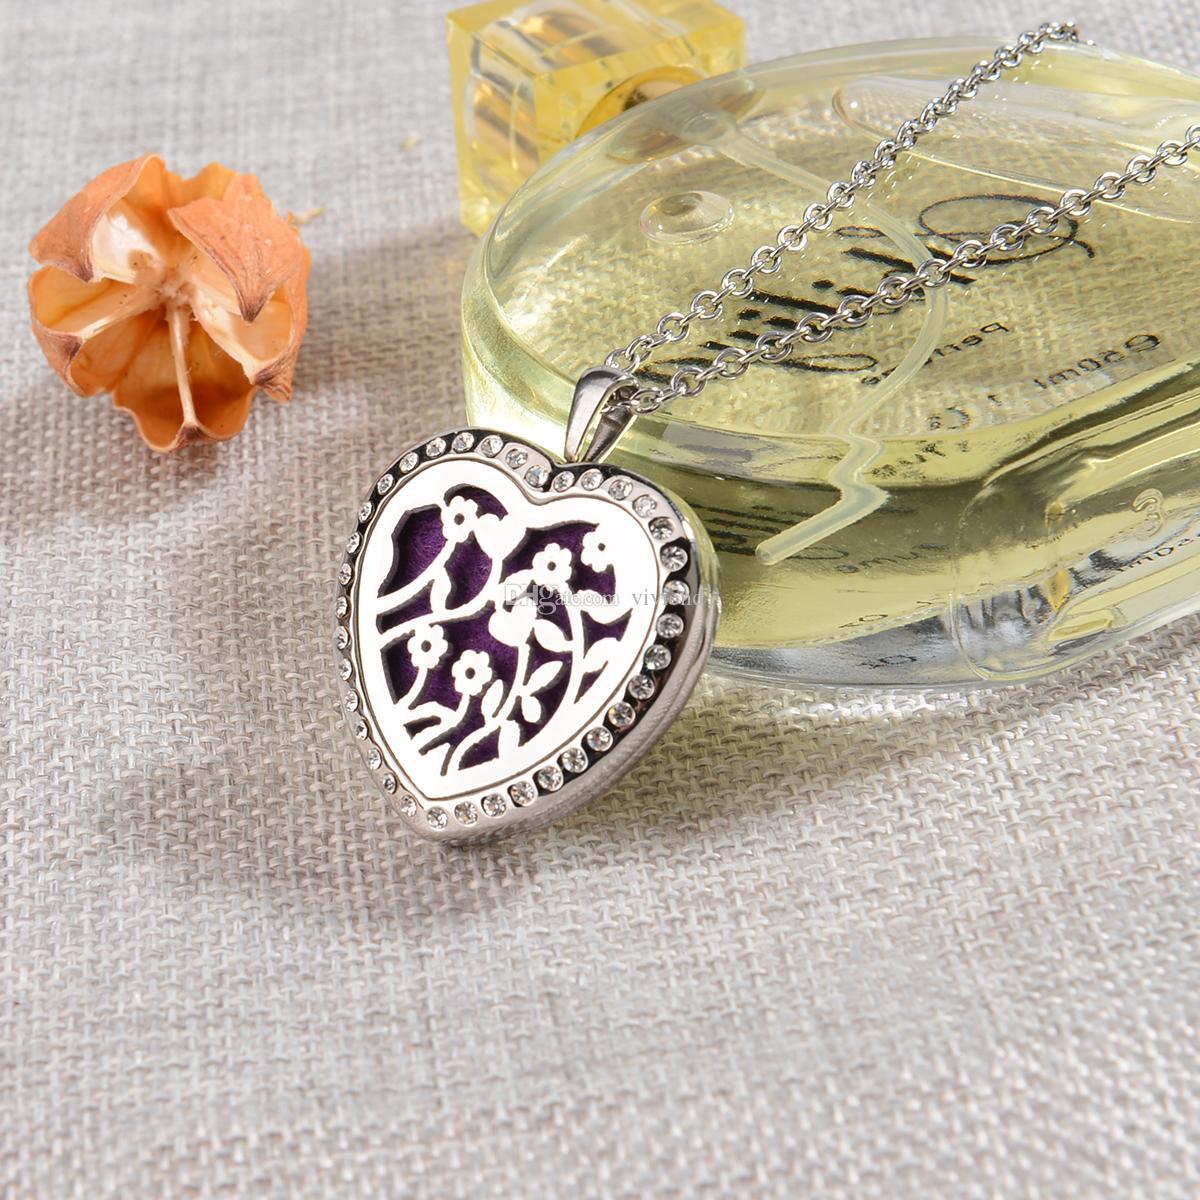 Ätherisches Öl Diffusor Aromatherapie Halskette-30MM Blumen Herz Strass Medaillon Anhänger, 10 Refill Pads